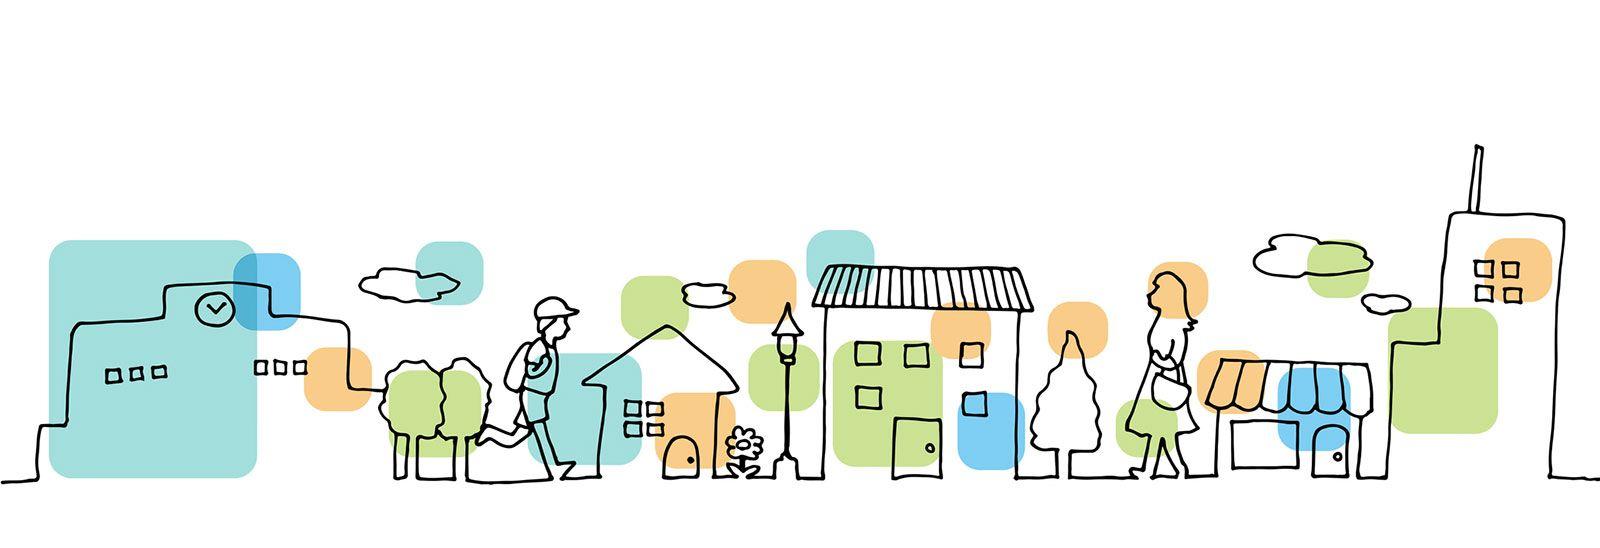 Line drawing of a neighbourhood street banner image